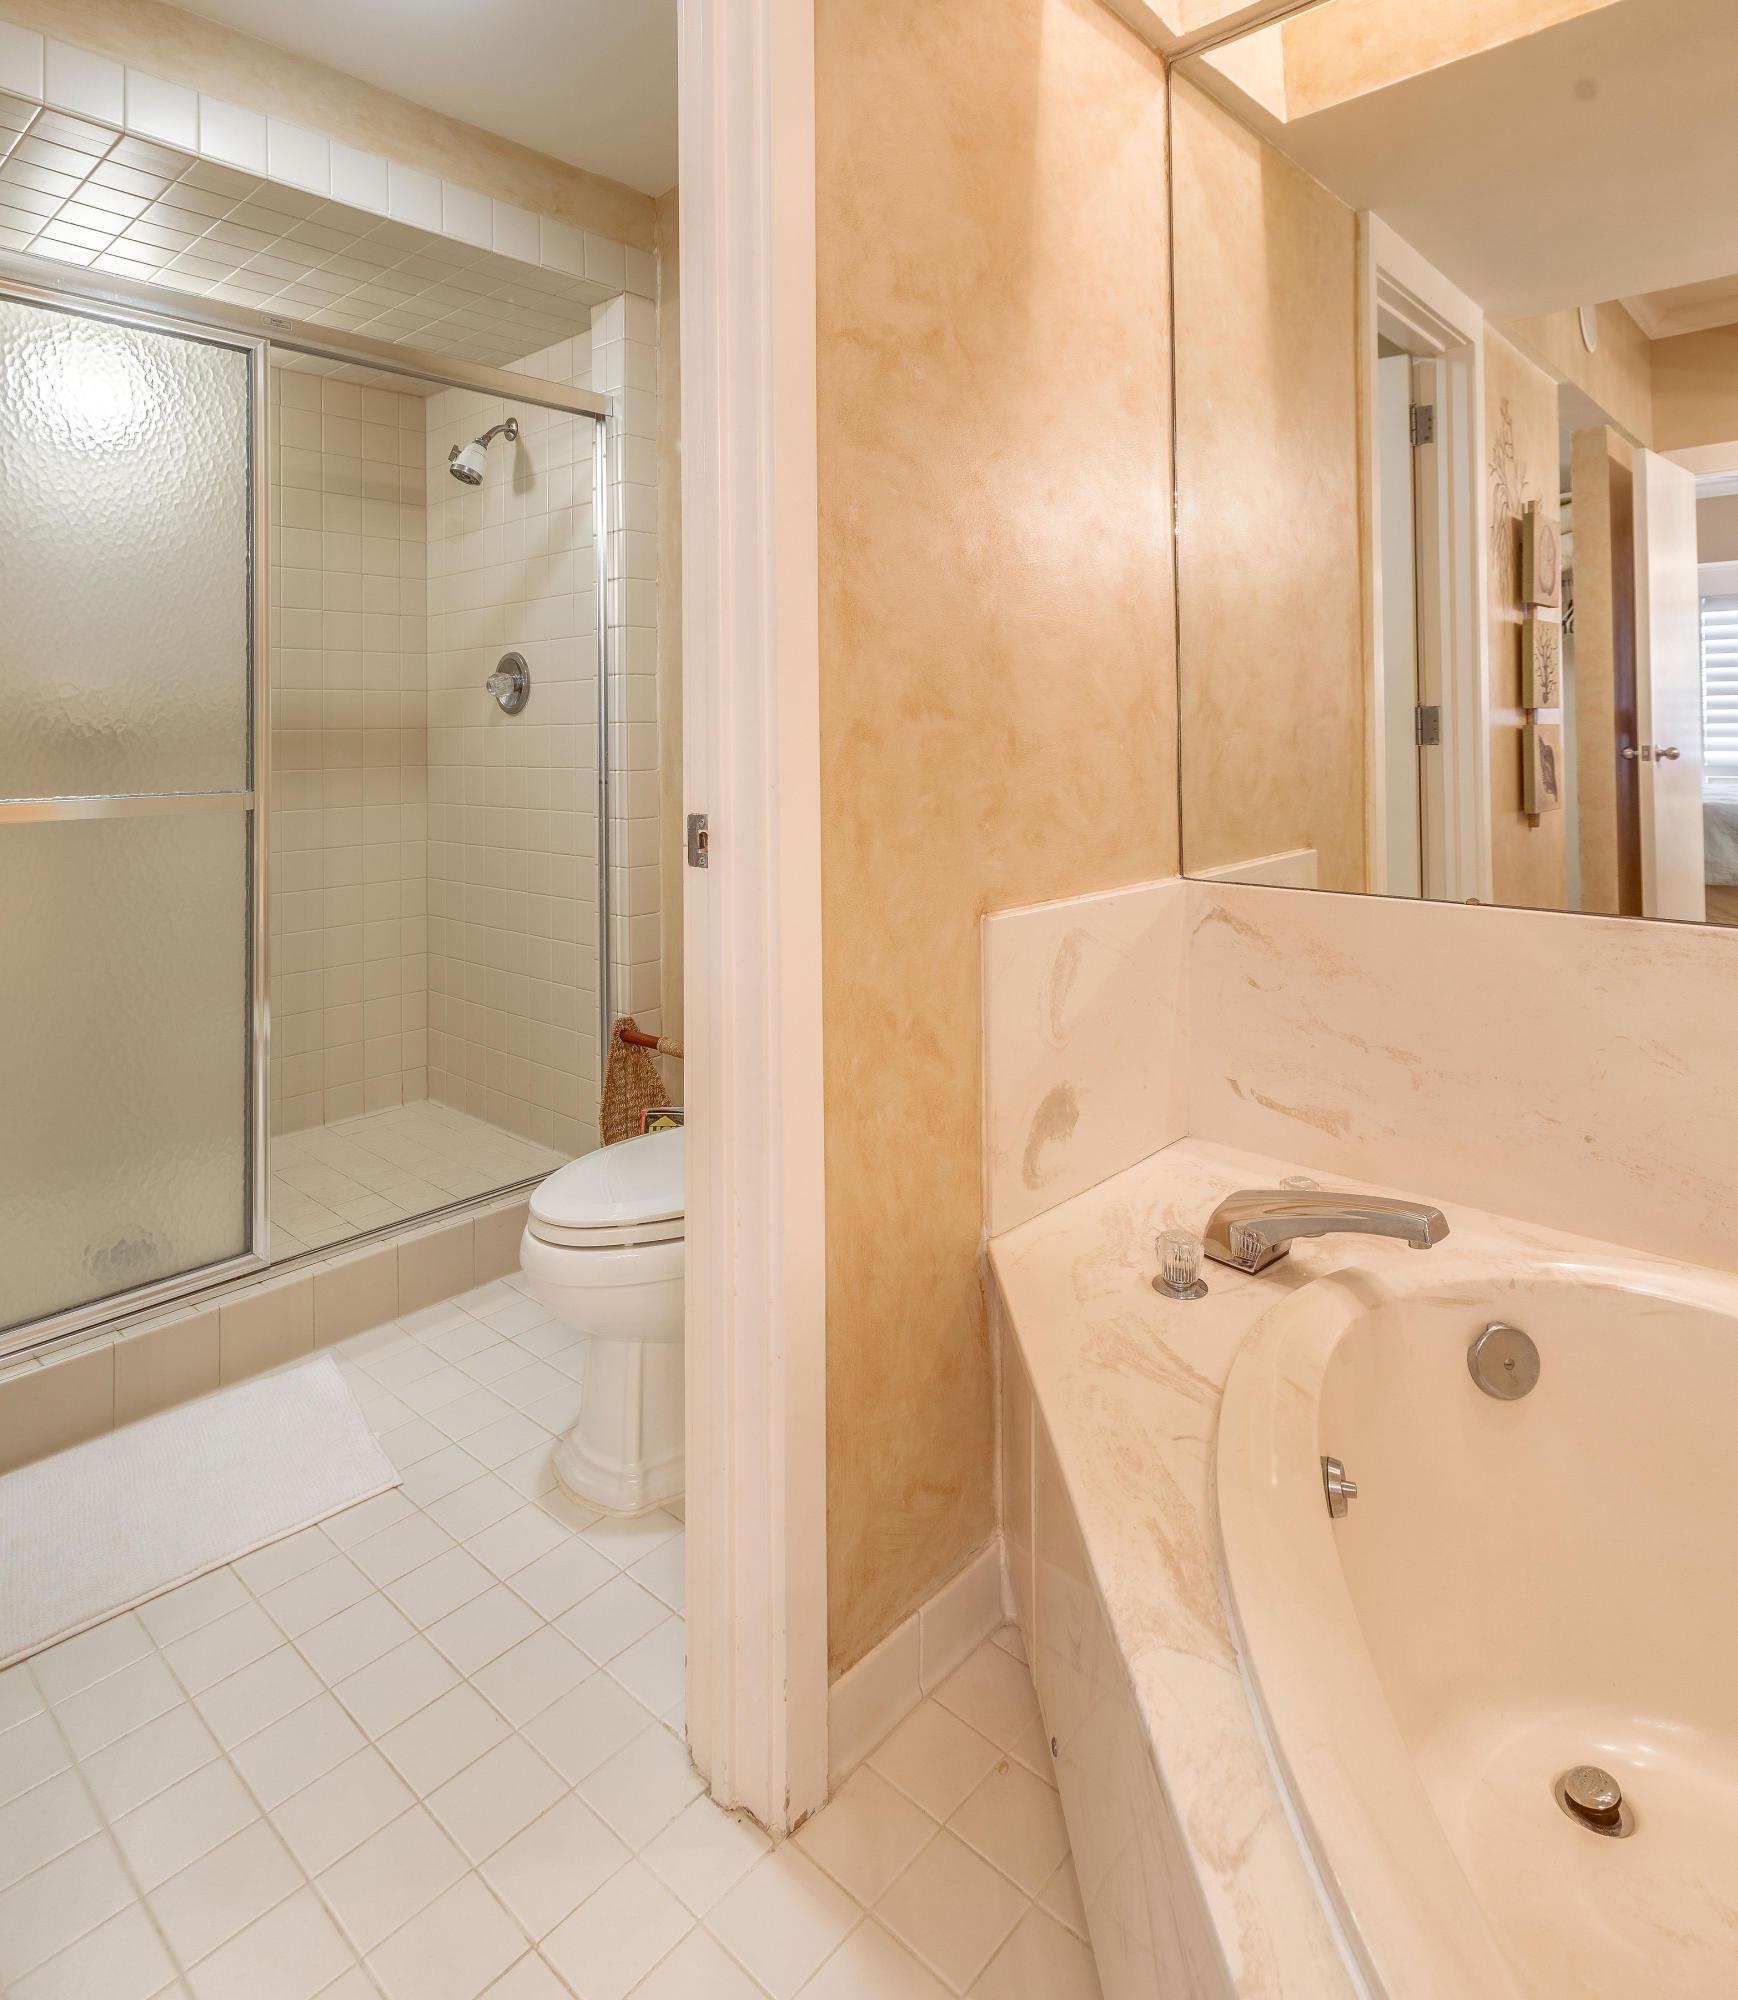 Wild Dunes Homes For Sale - 1405 Ocean Club Villa, Isle of Palms, SC - 29